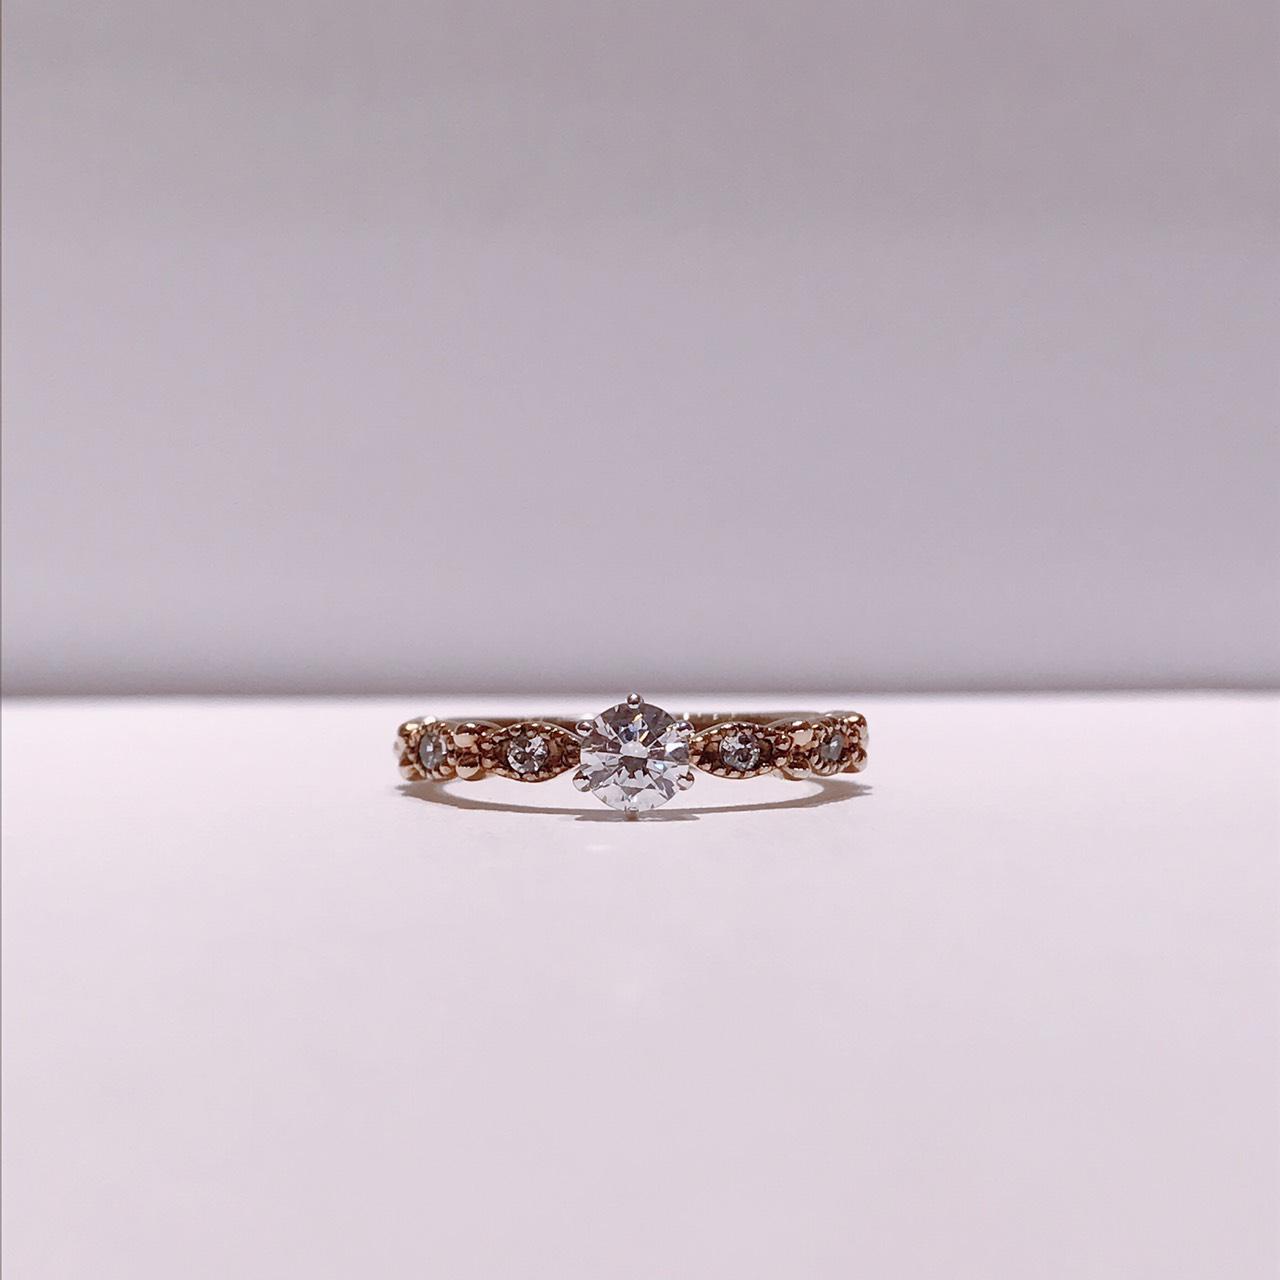 BROOCH 婚約指輪 エンゲージリング アンティーク風デザイン